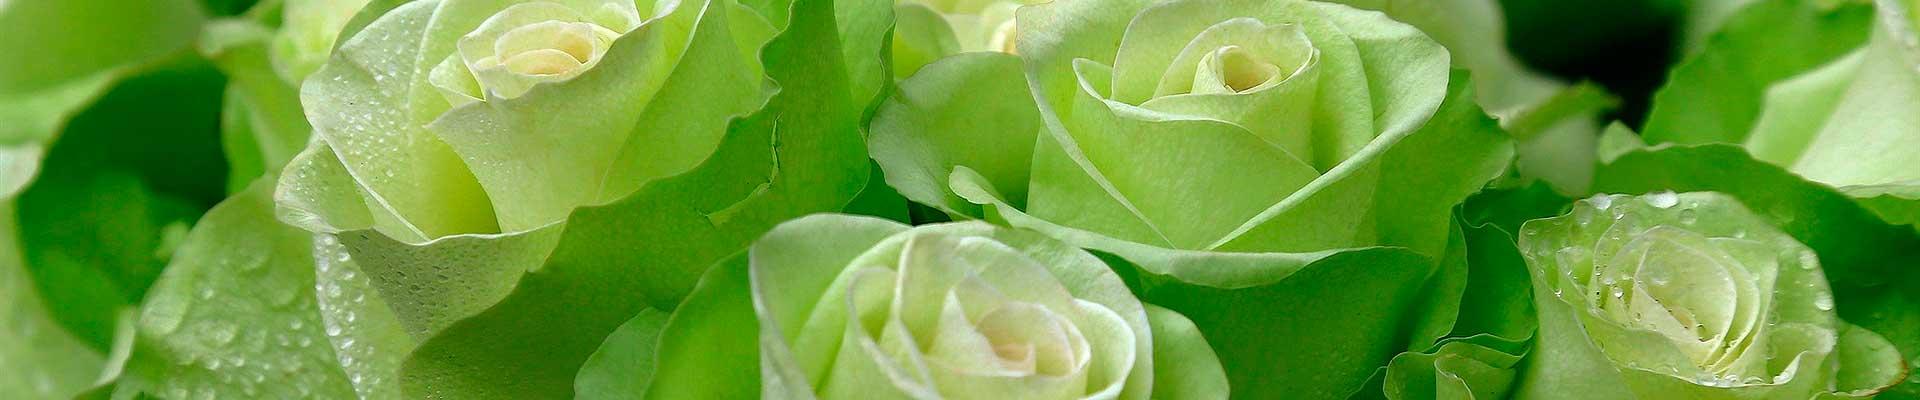 flores de cor verde